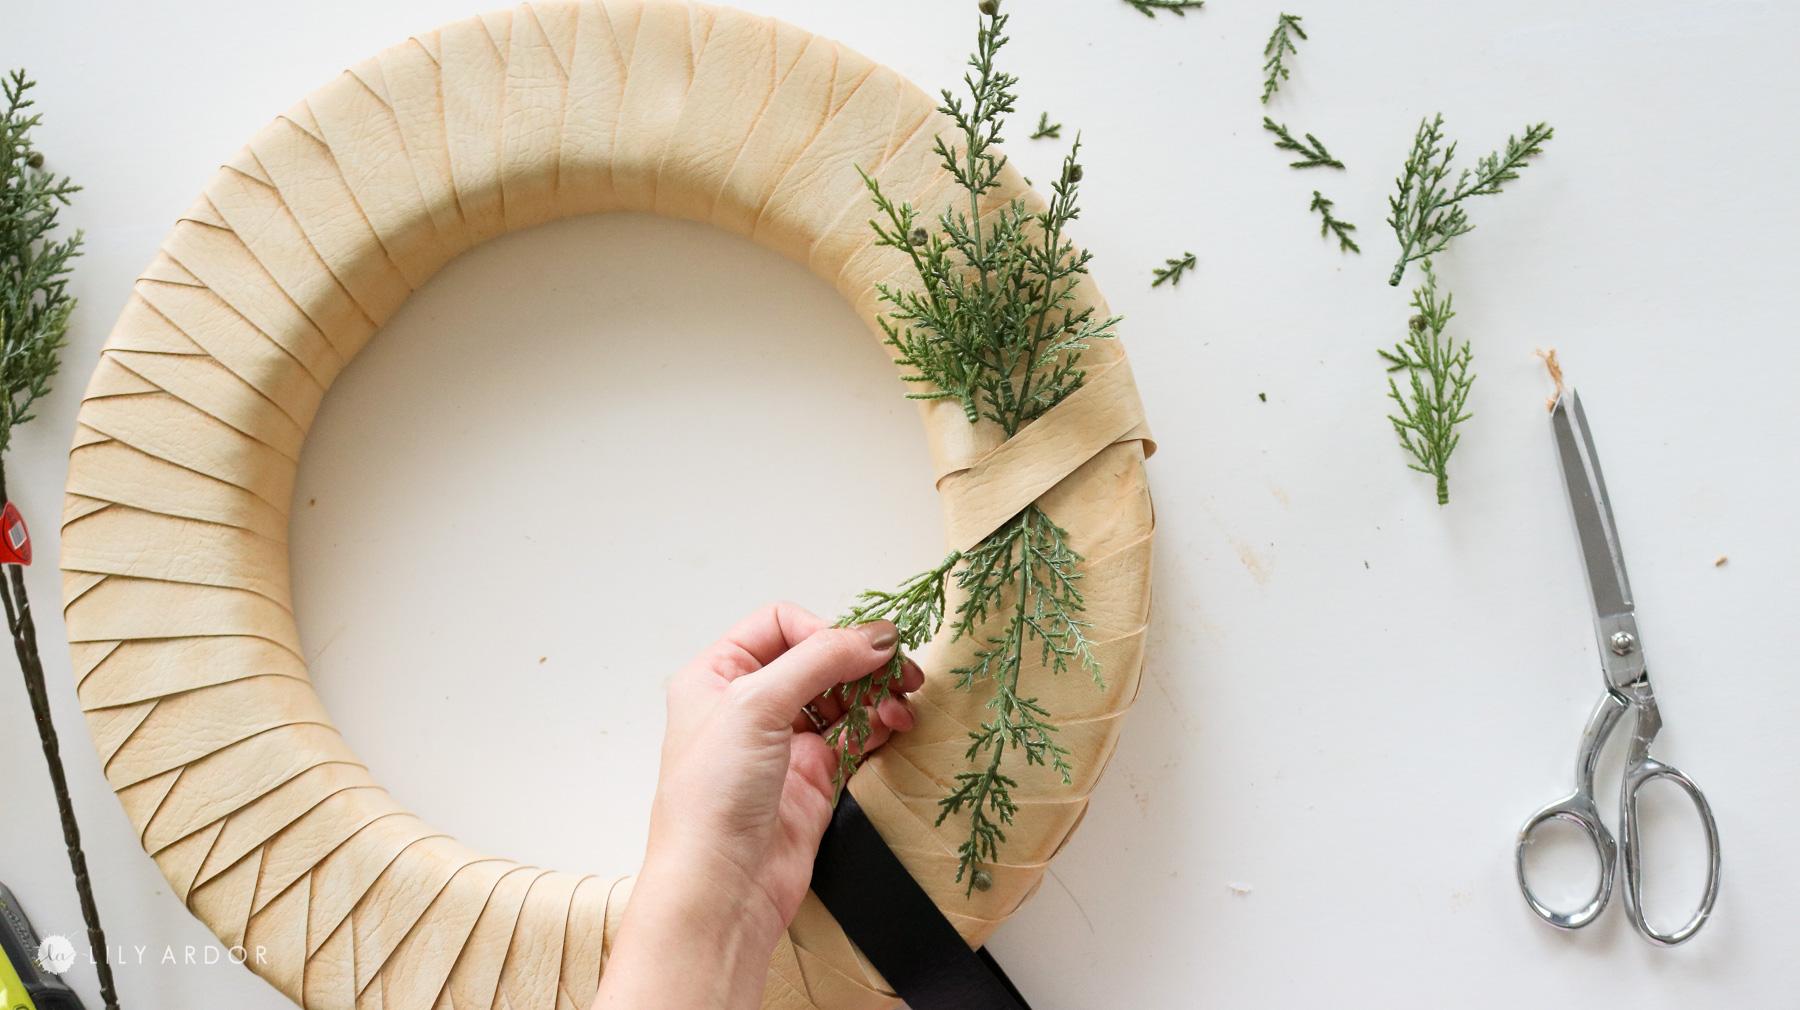 adding greenery to my DIY wreath